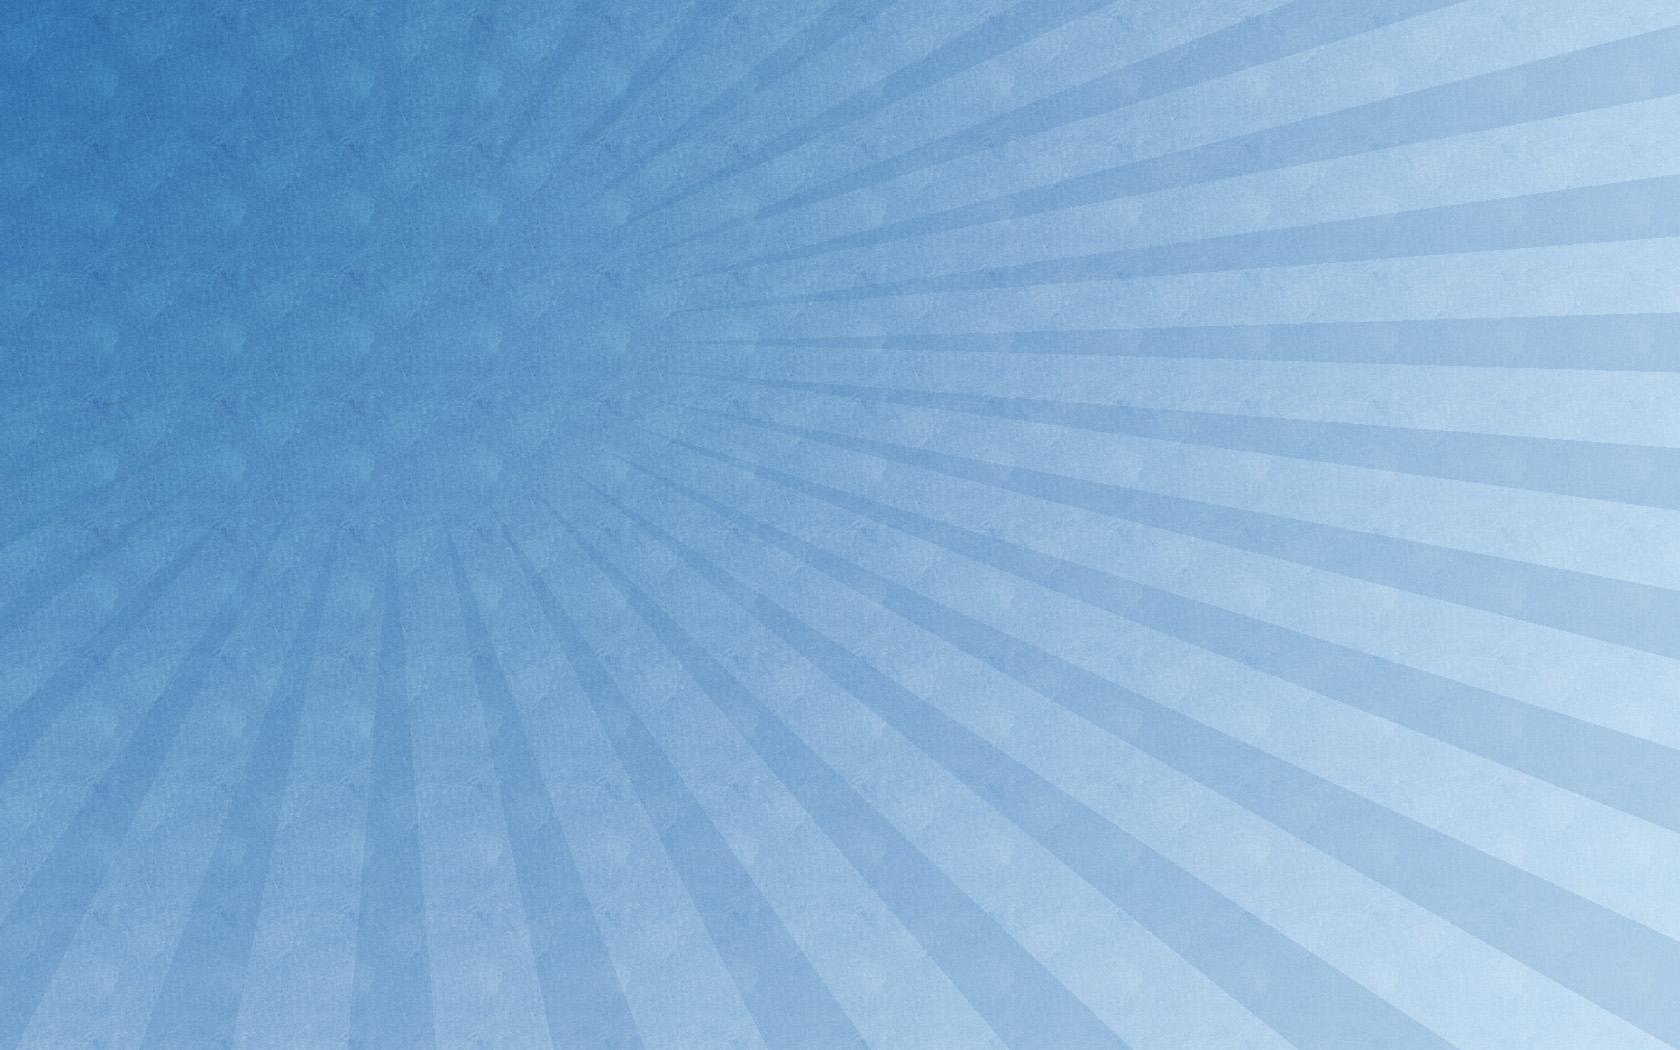 Light Blue Radial Burst WS by terpmeister on deviantART